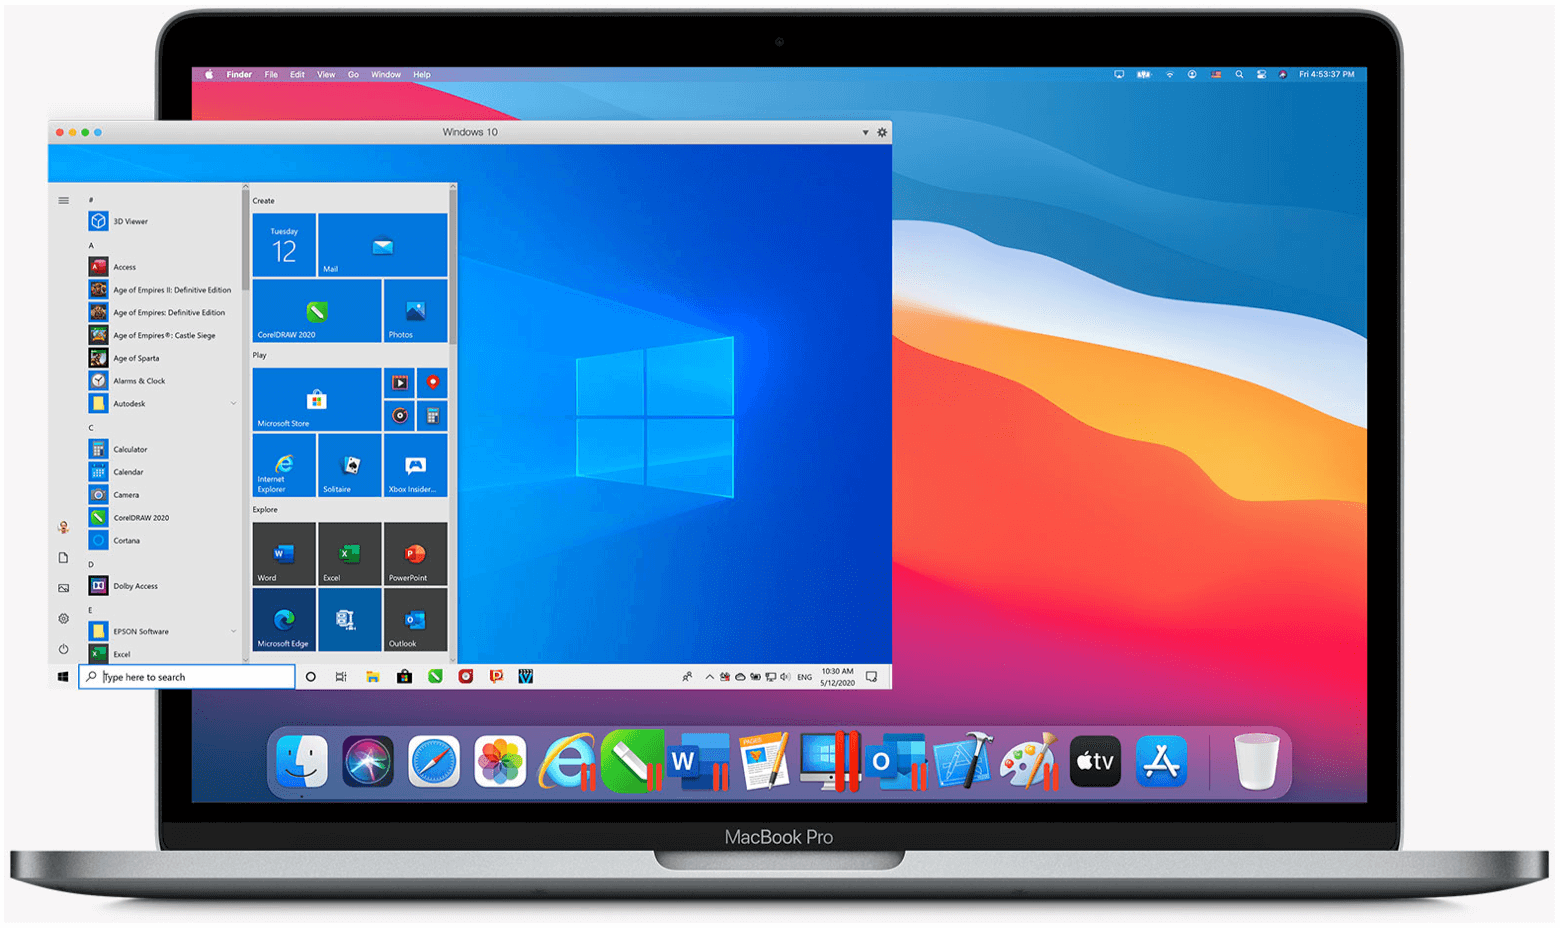 Windows 10 on M1 Macs Parallels Desktop 16 for Mac